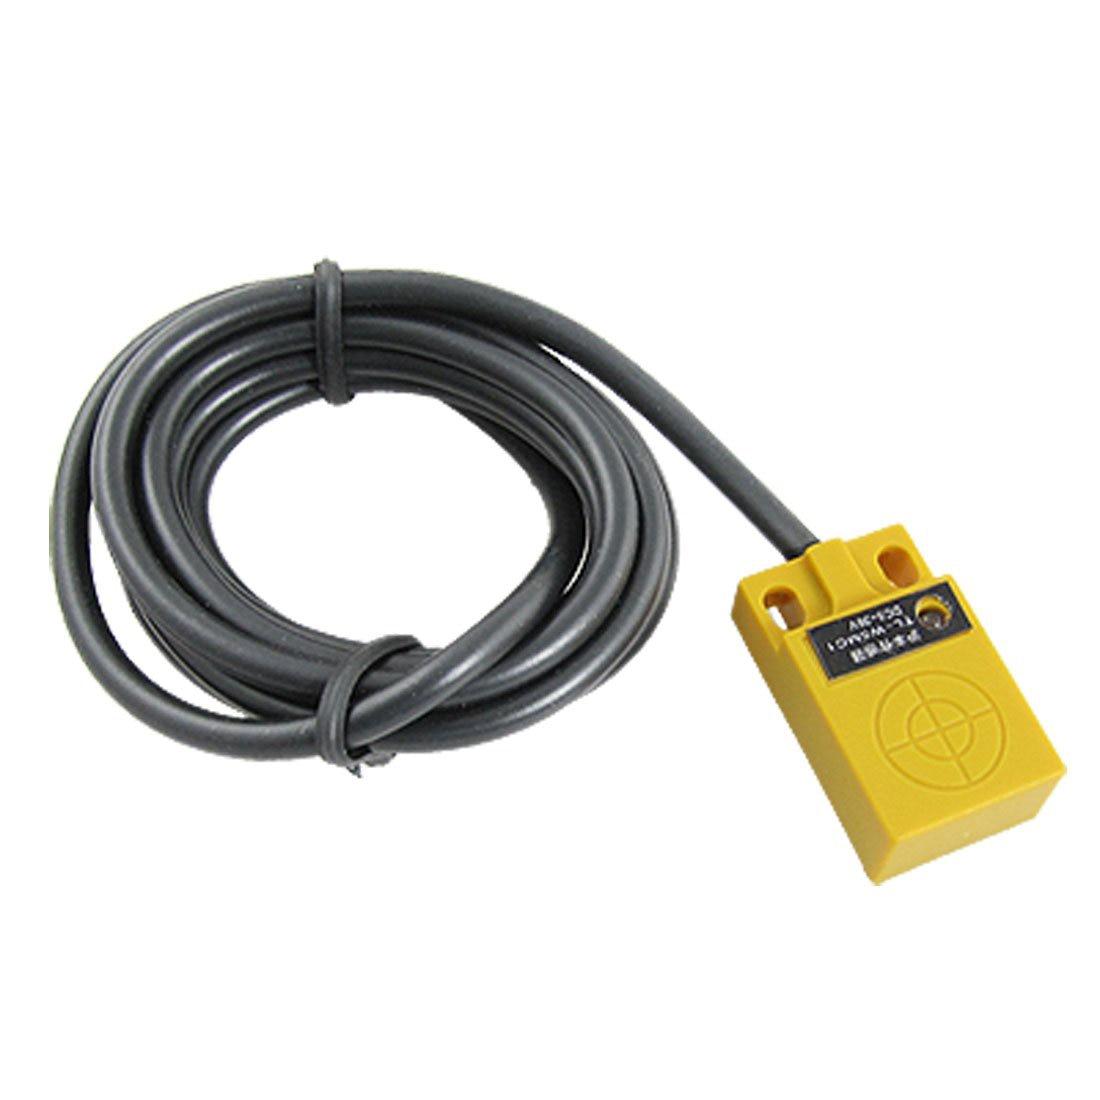 все цены на THGS Tl-w5mc1 Dc 3-wire Type Square Proximity Sensor Switch онлайн